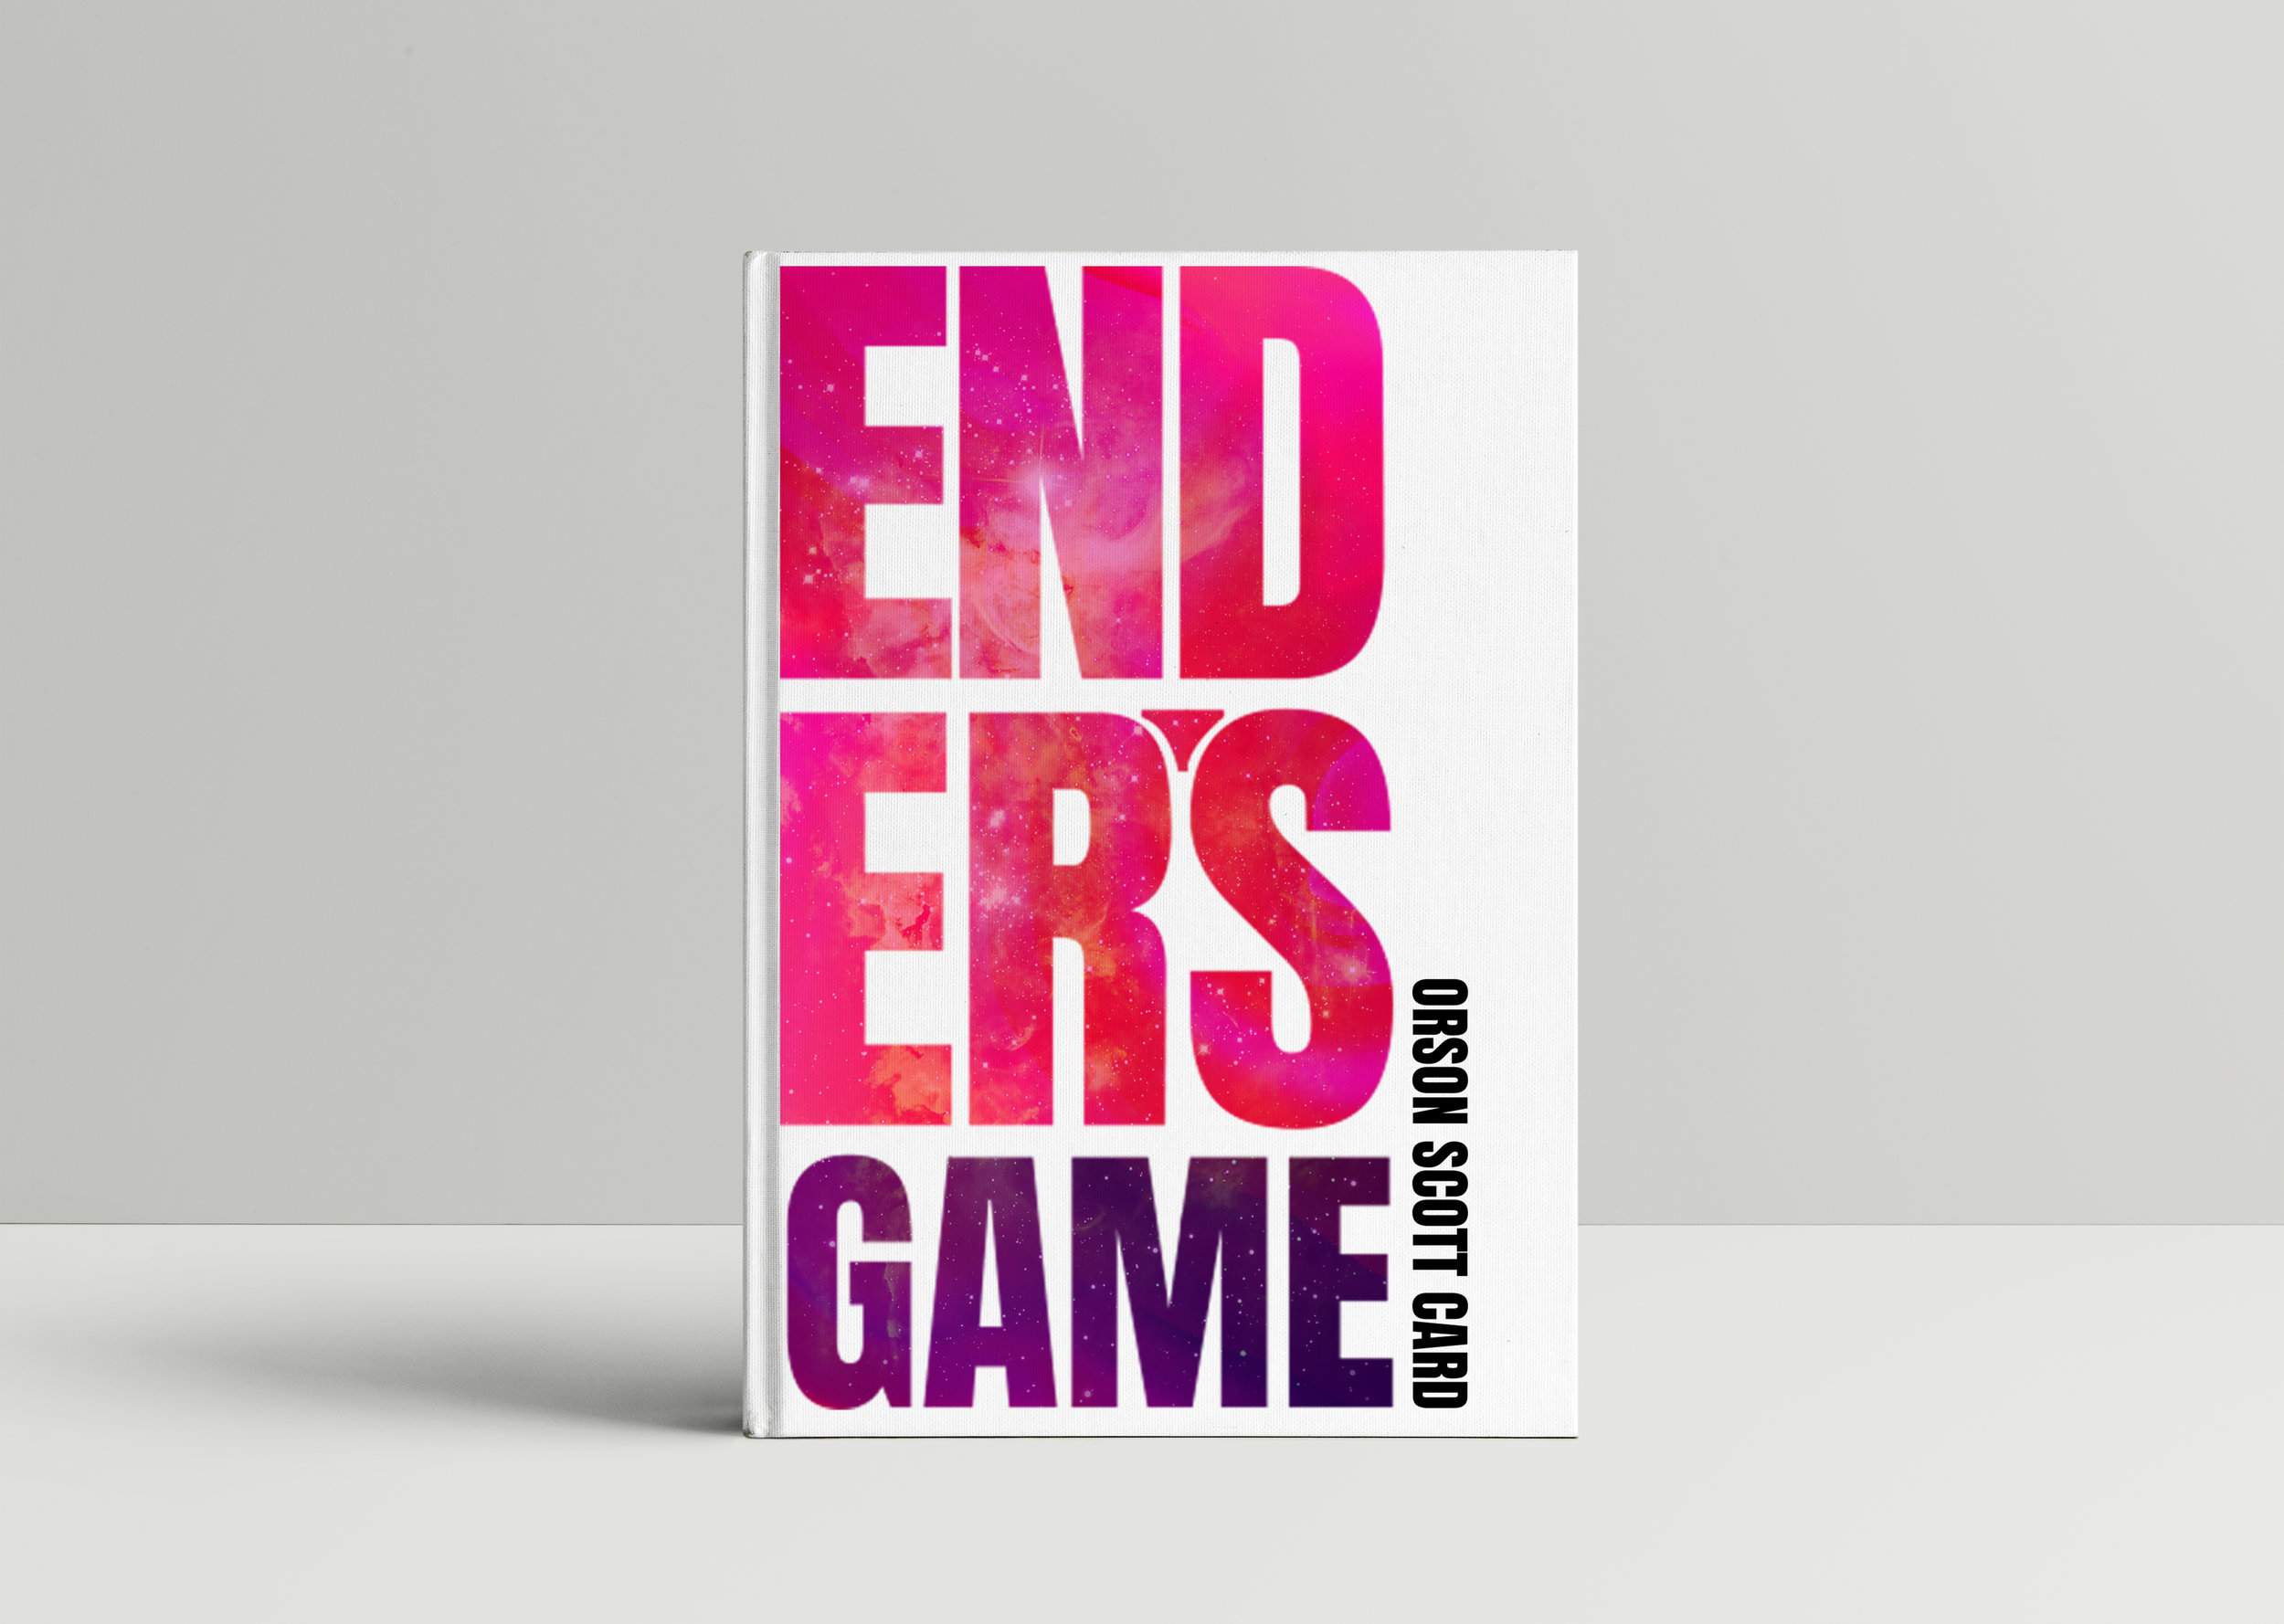 Endersgame_cover_mock.jpg